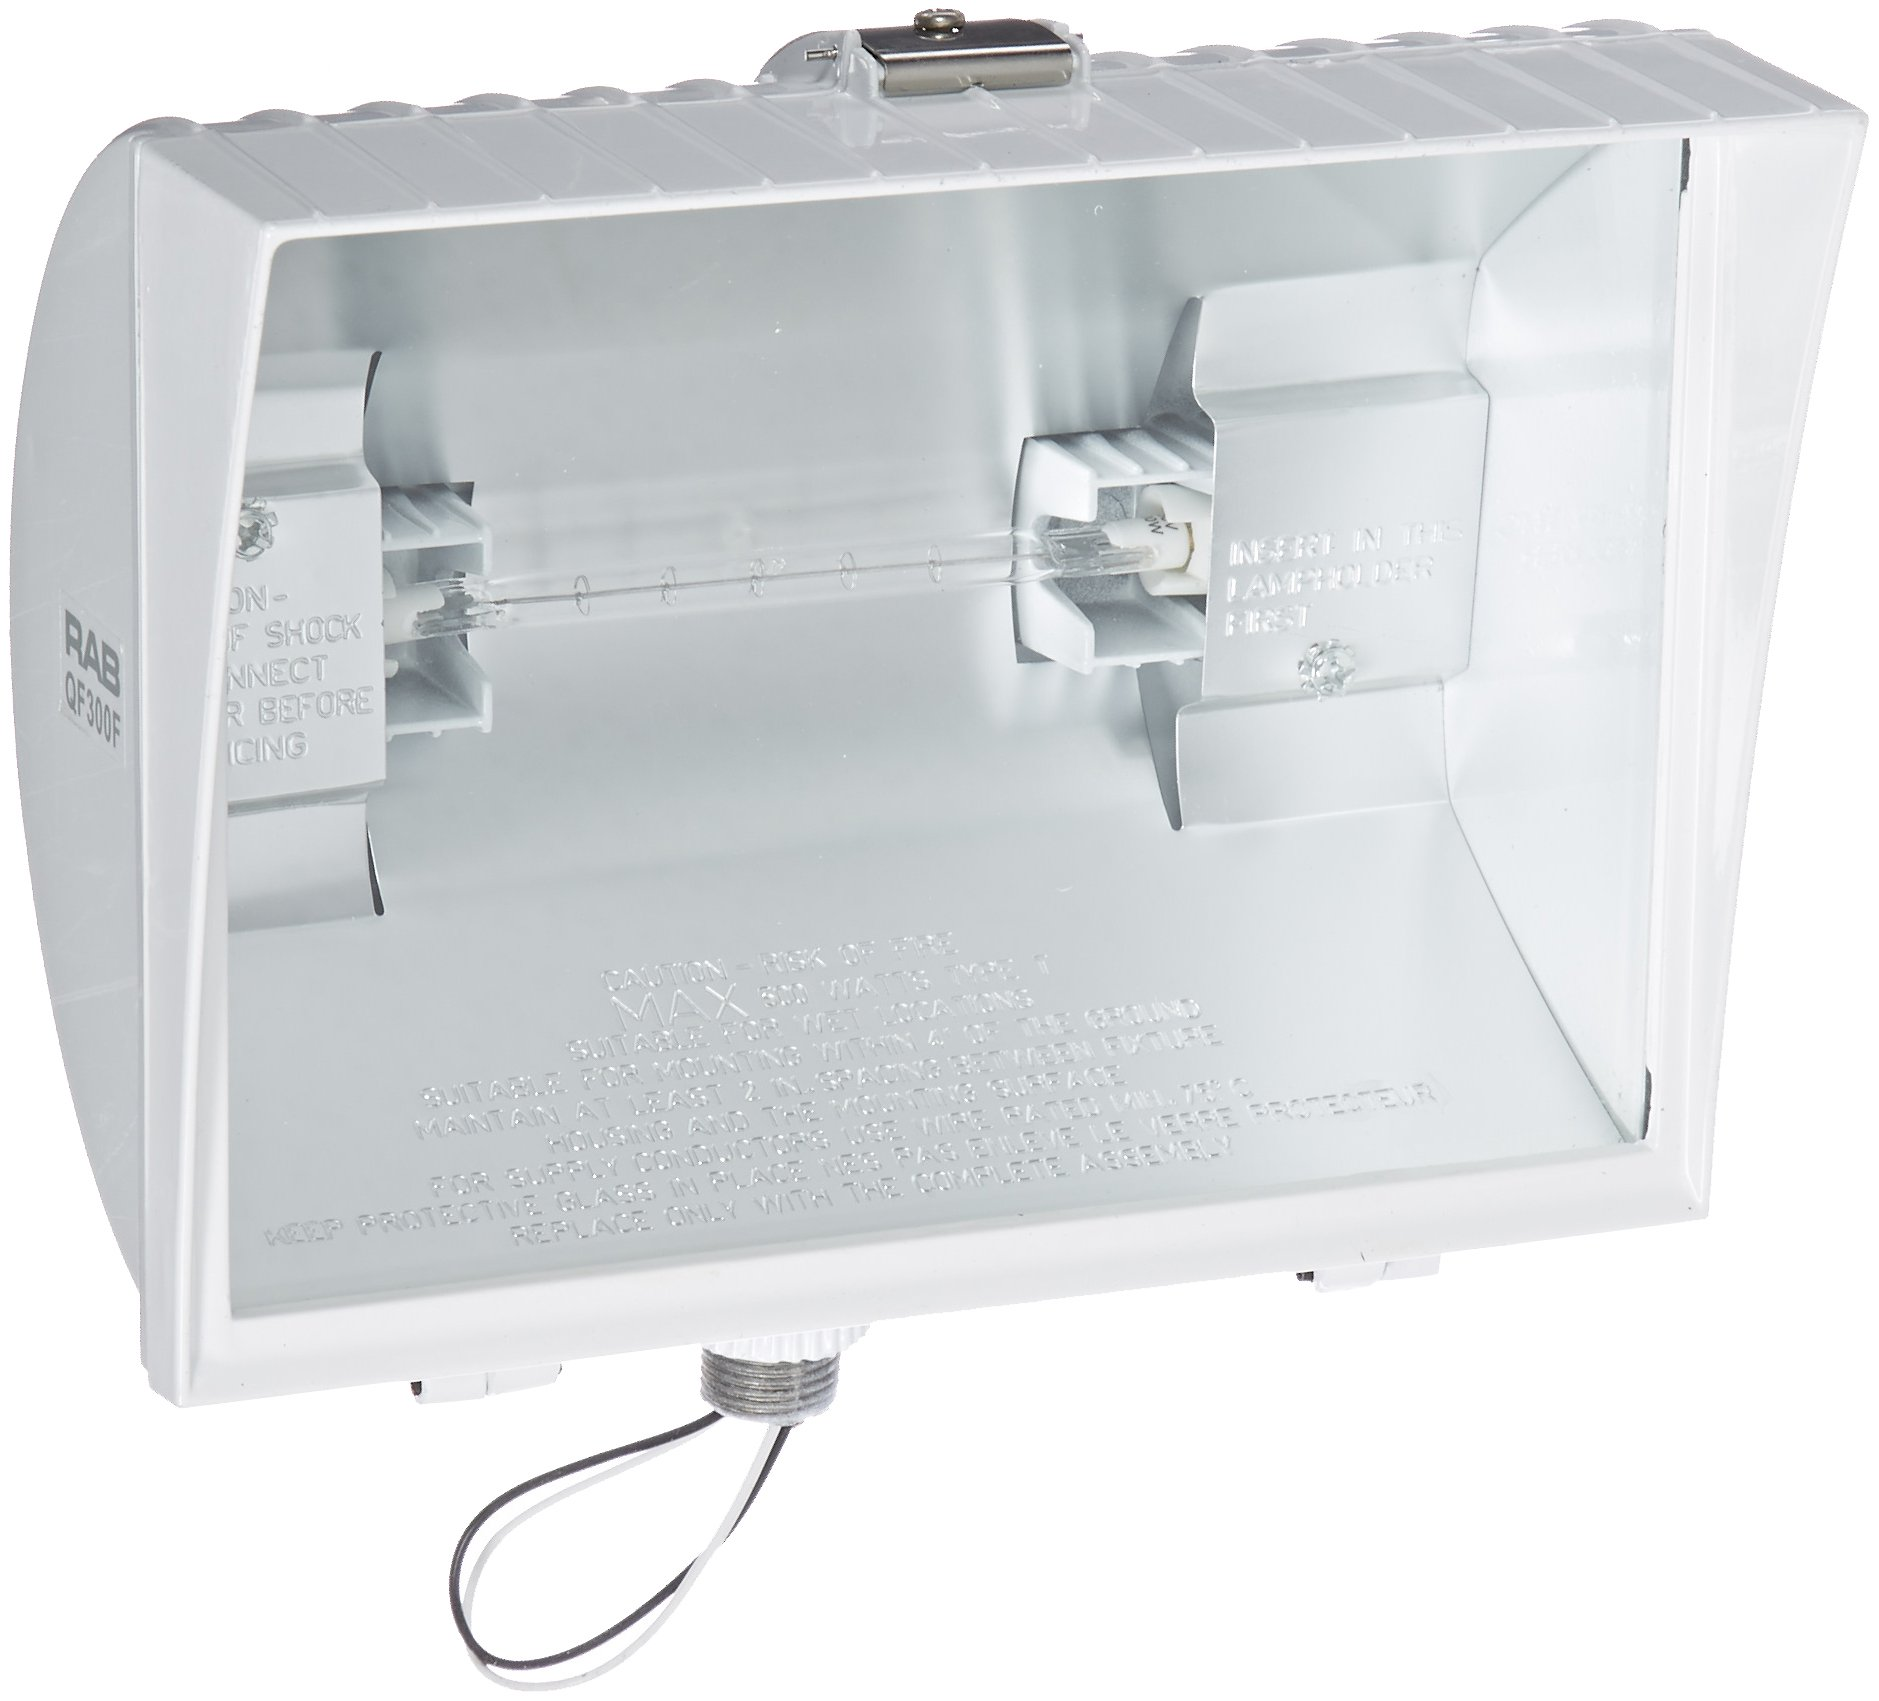 RAB Lighting QF300FW Quartz Curve Floodlight, Aluminum, 300W Power, 6100 Lumens, 120V, White